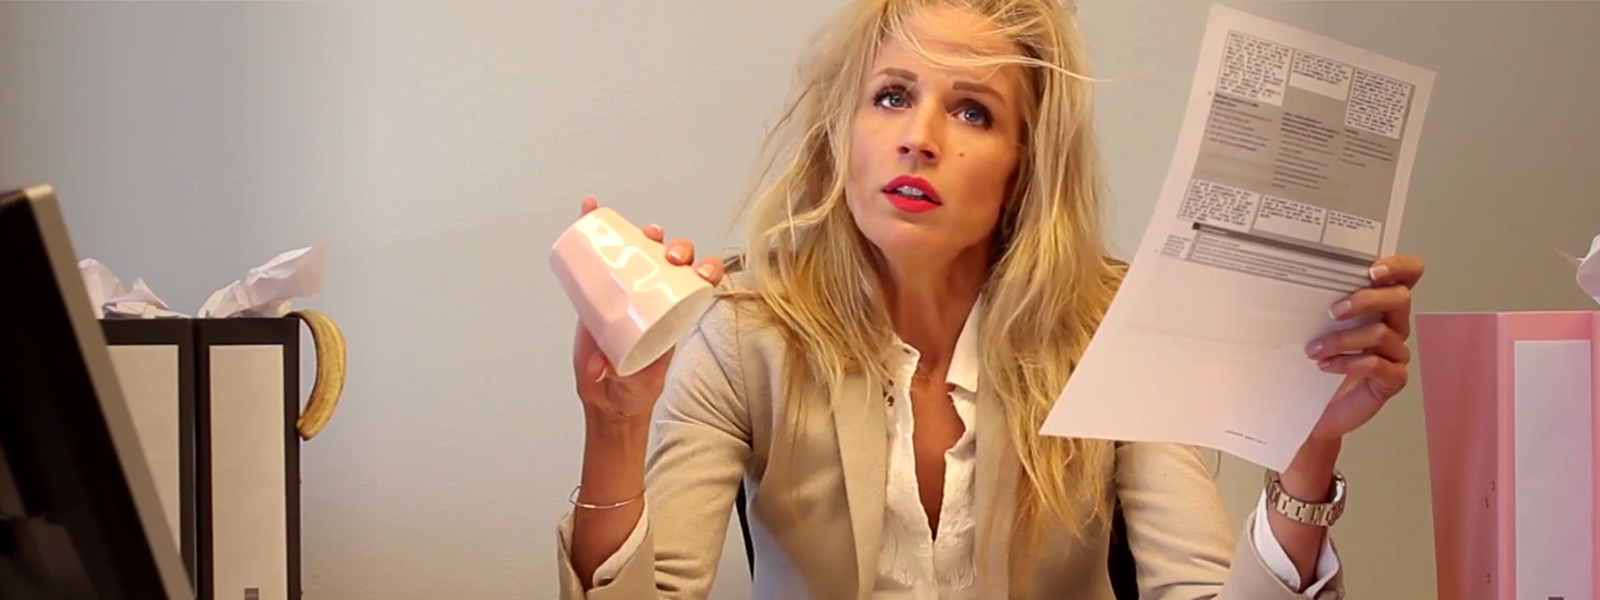 HorecaNederland.TV presentatrice Carien Keizer